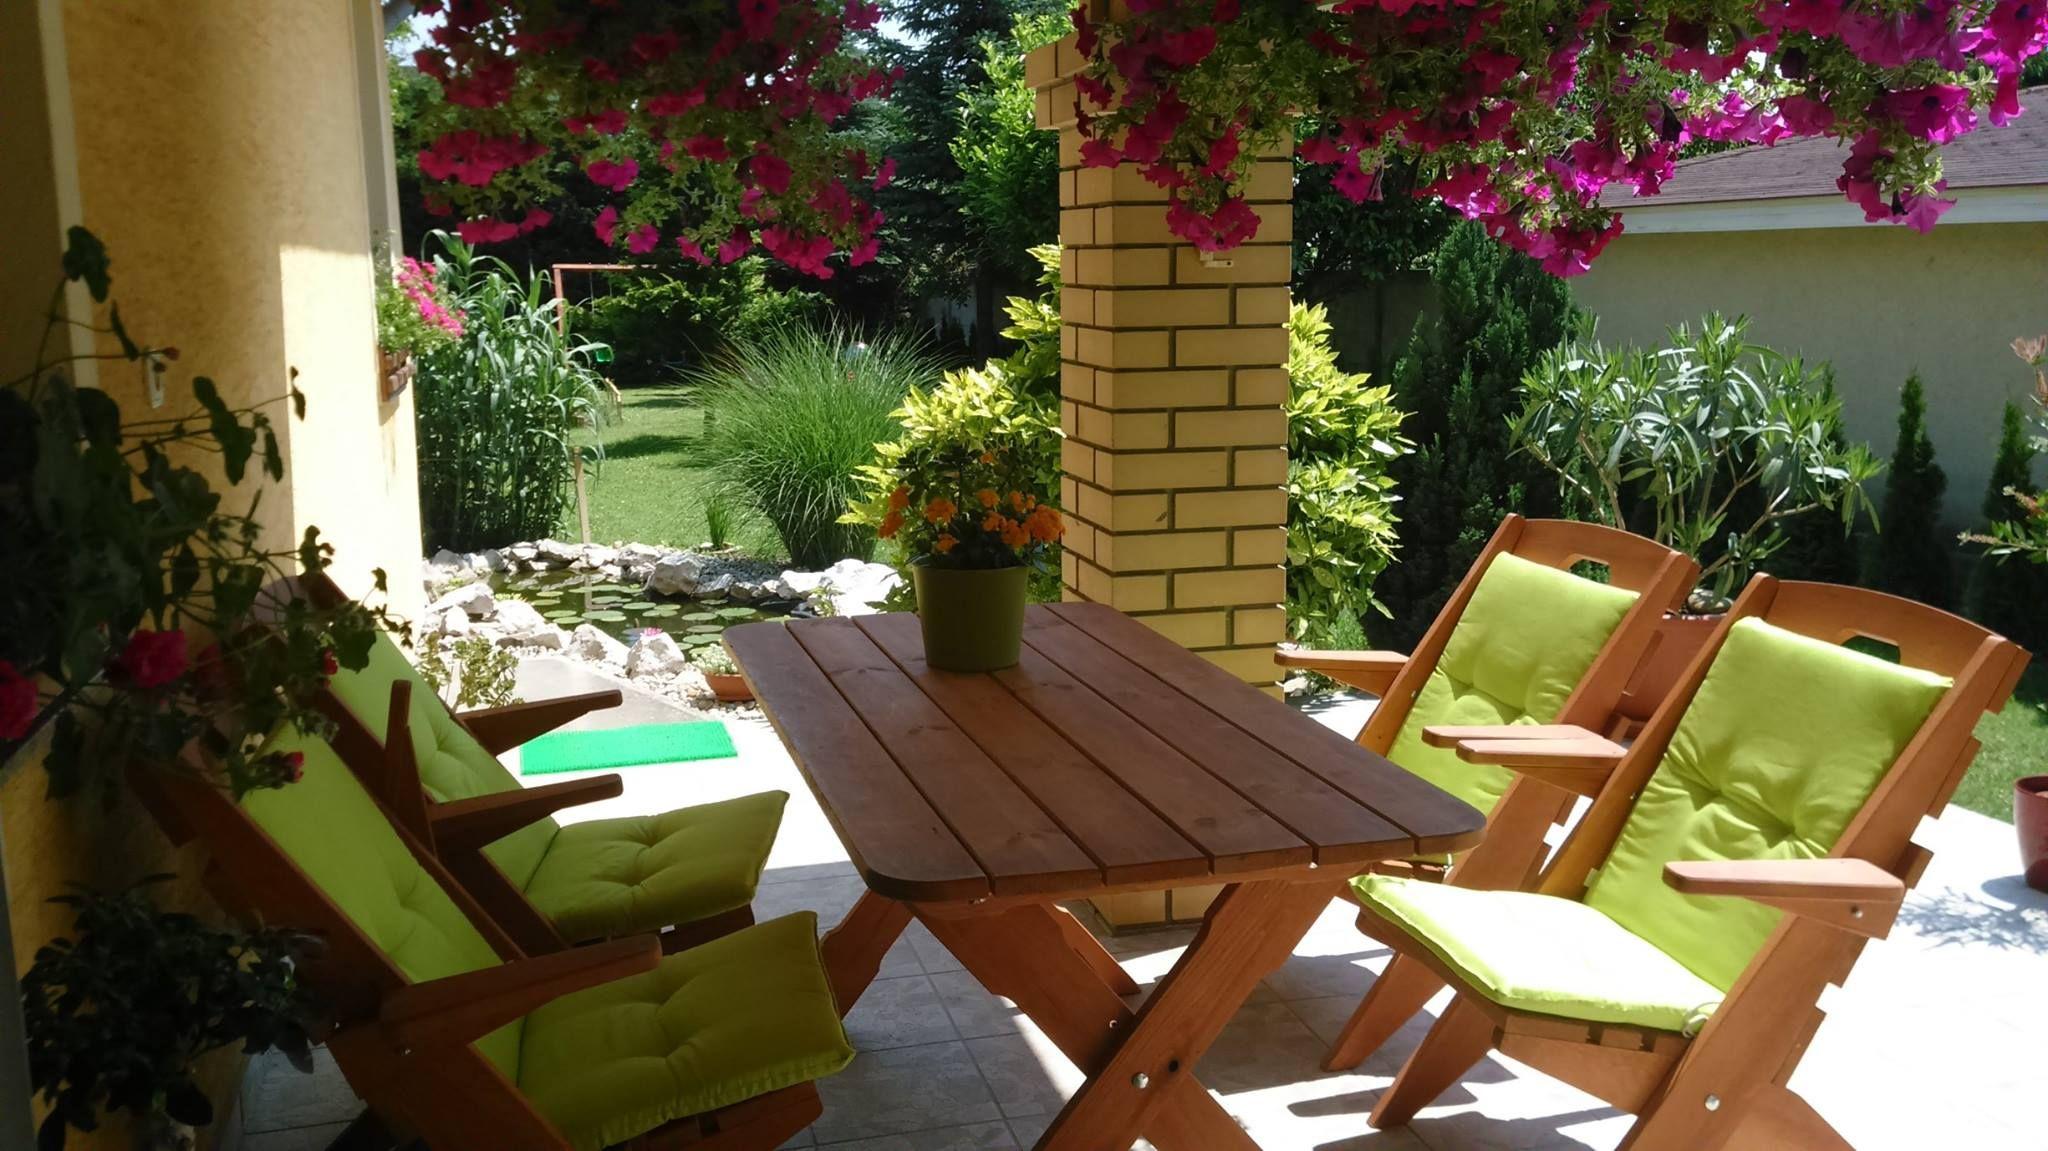 Niedriglehner Auflagen set - Gartenmöbel Holz - Farbe Havana Green ...